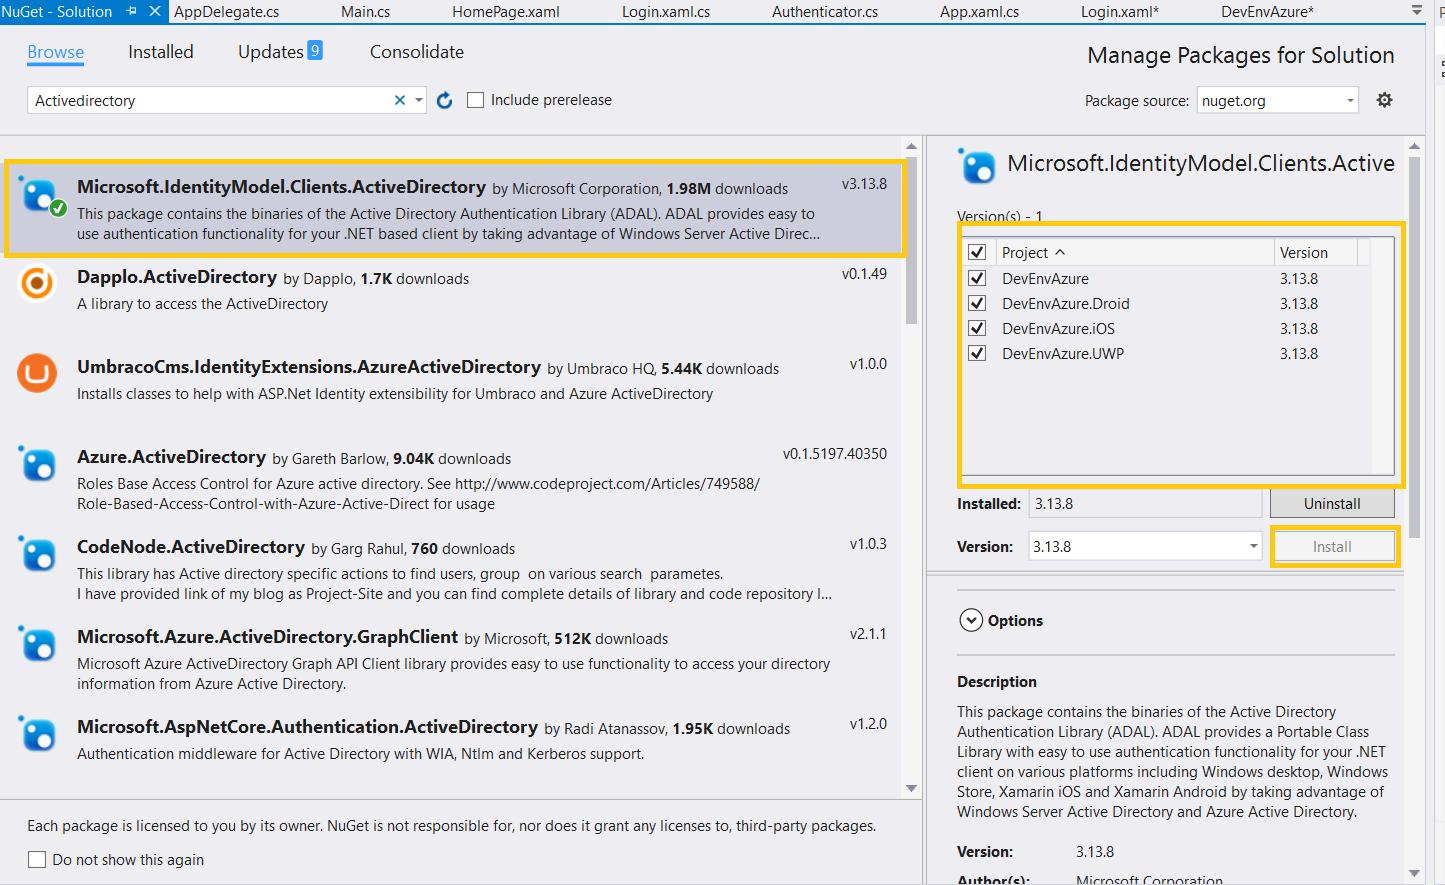 DevEnvExe Com/Xamarin: Azure Active Directory Login using Xamarin Forms